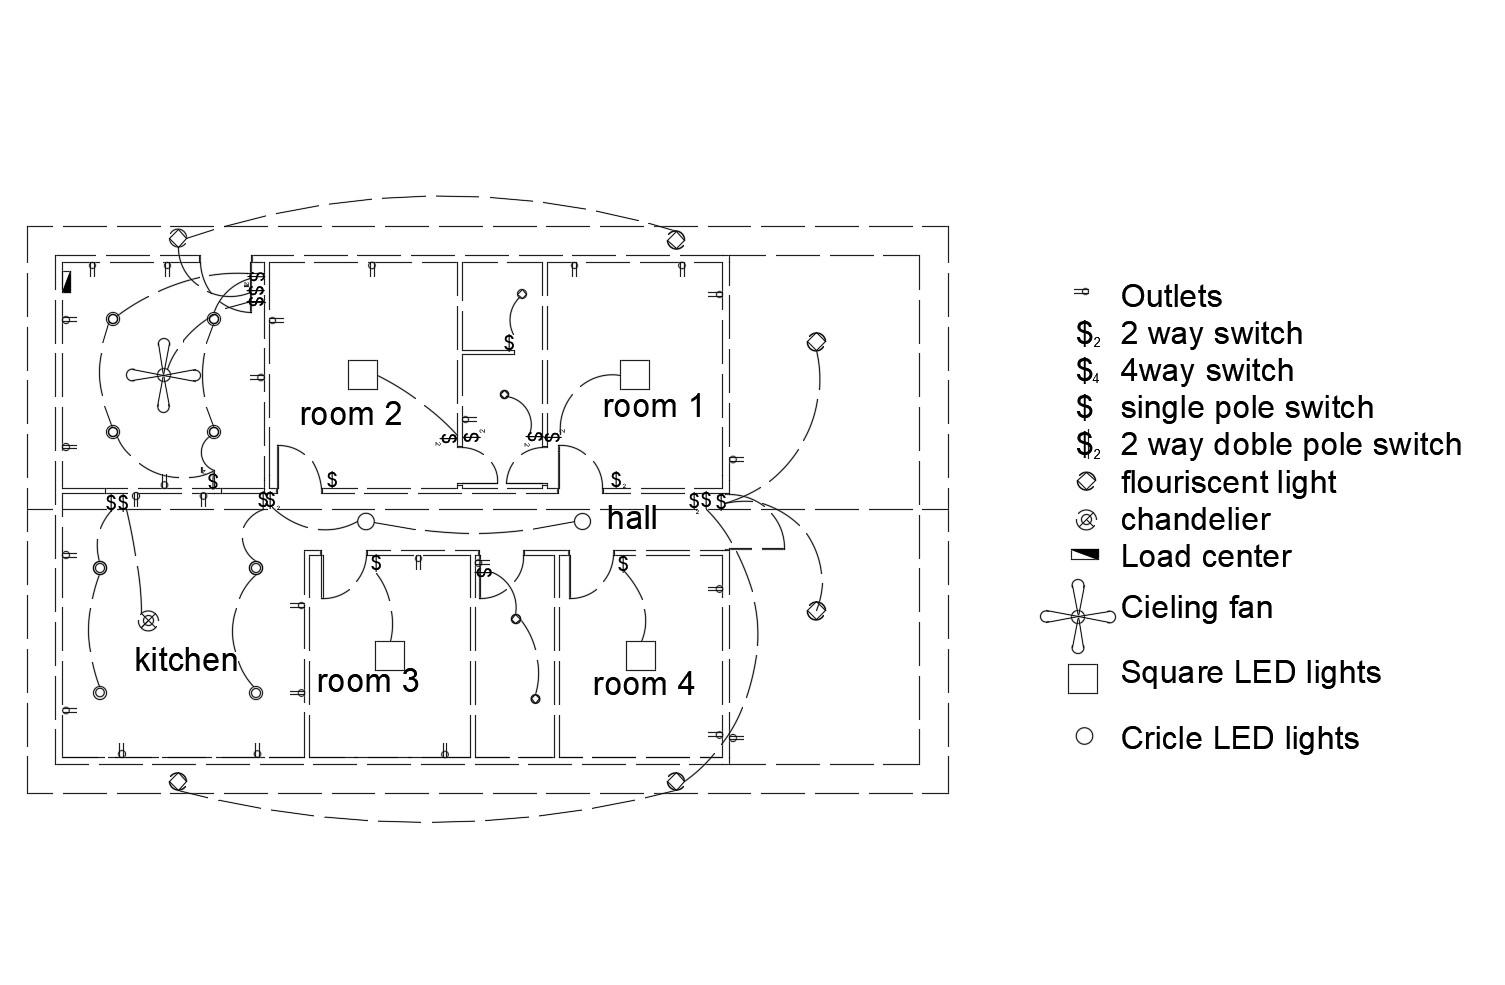 Wiring Diagram Ceiling Fan Amp Light 3 Way Switch